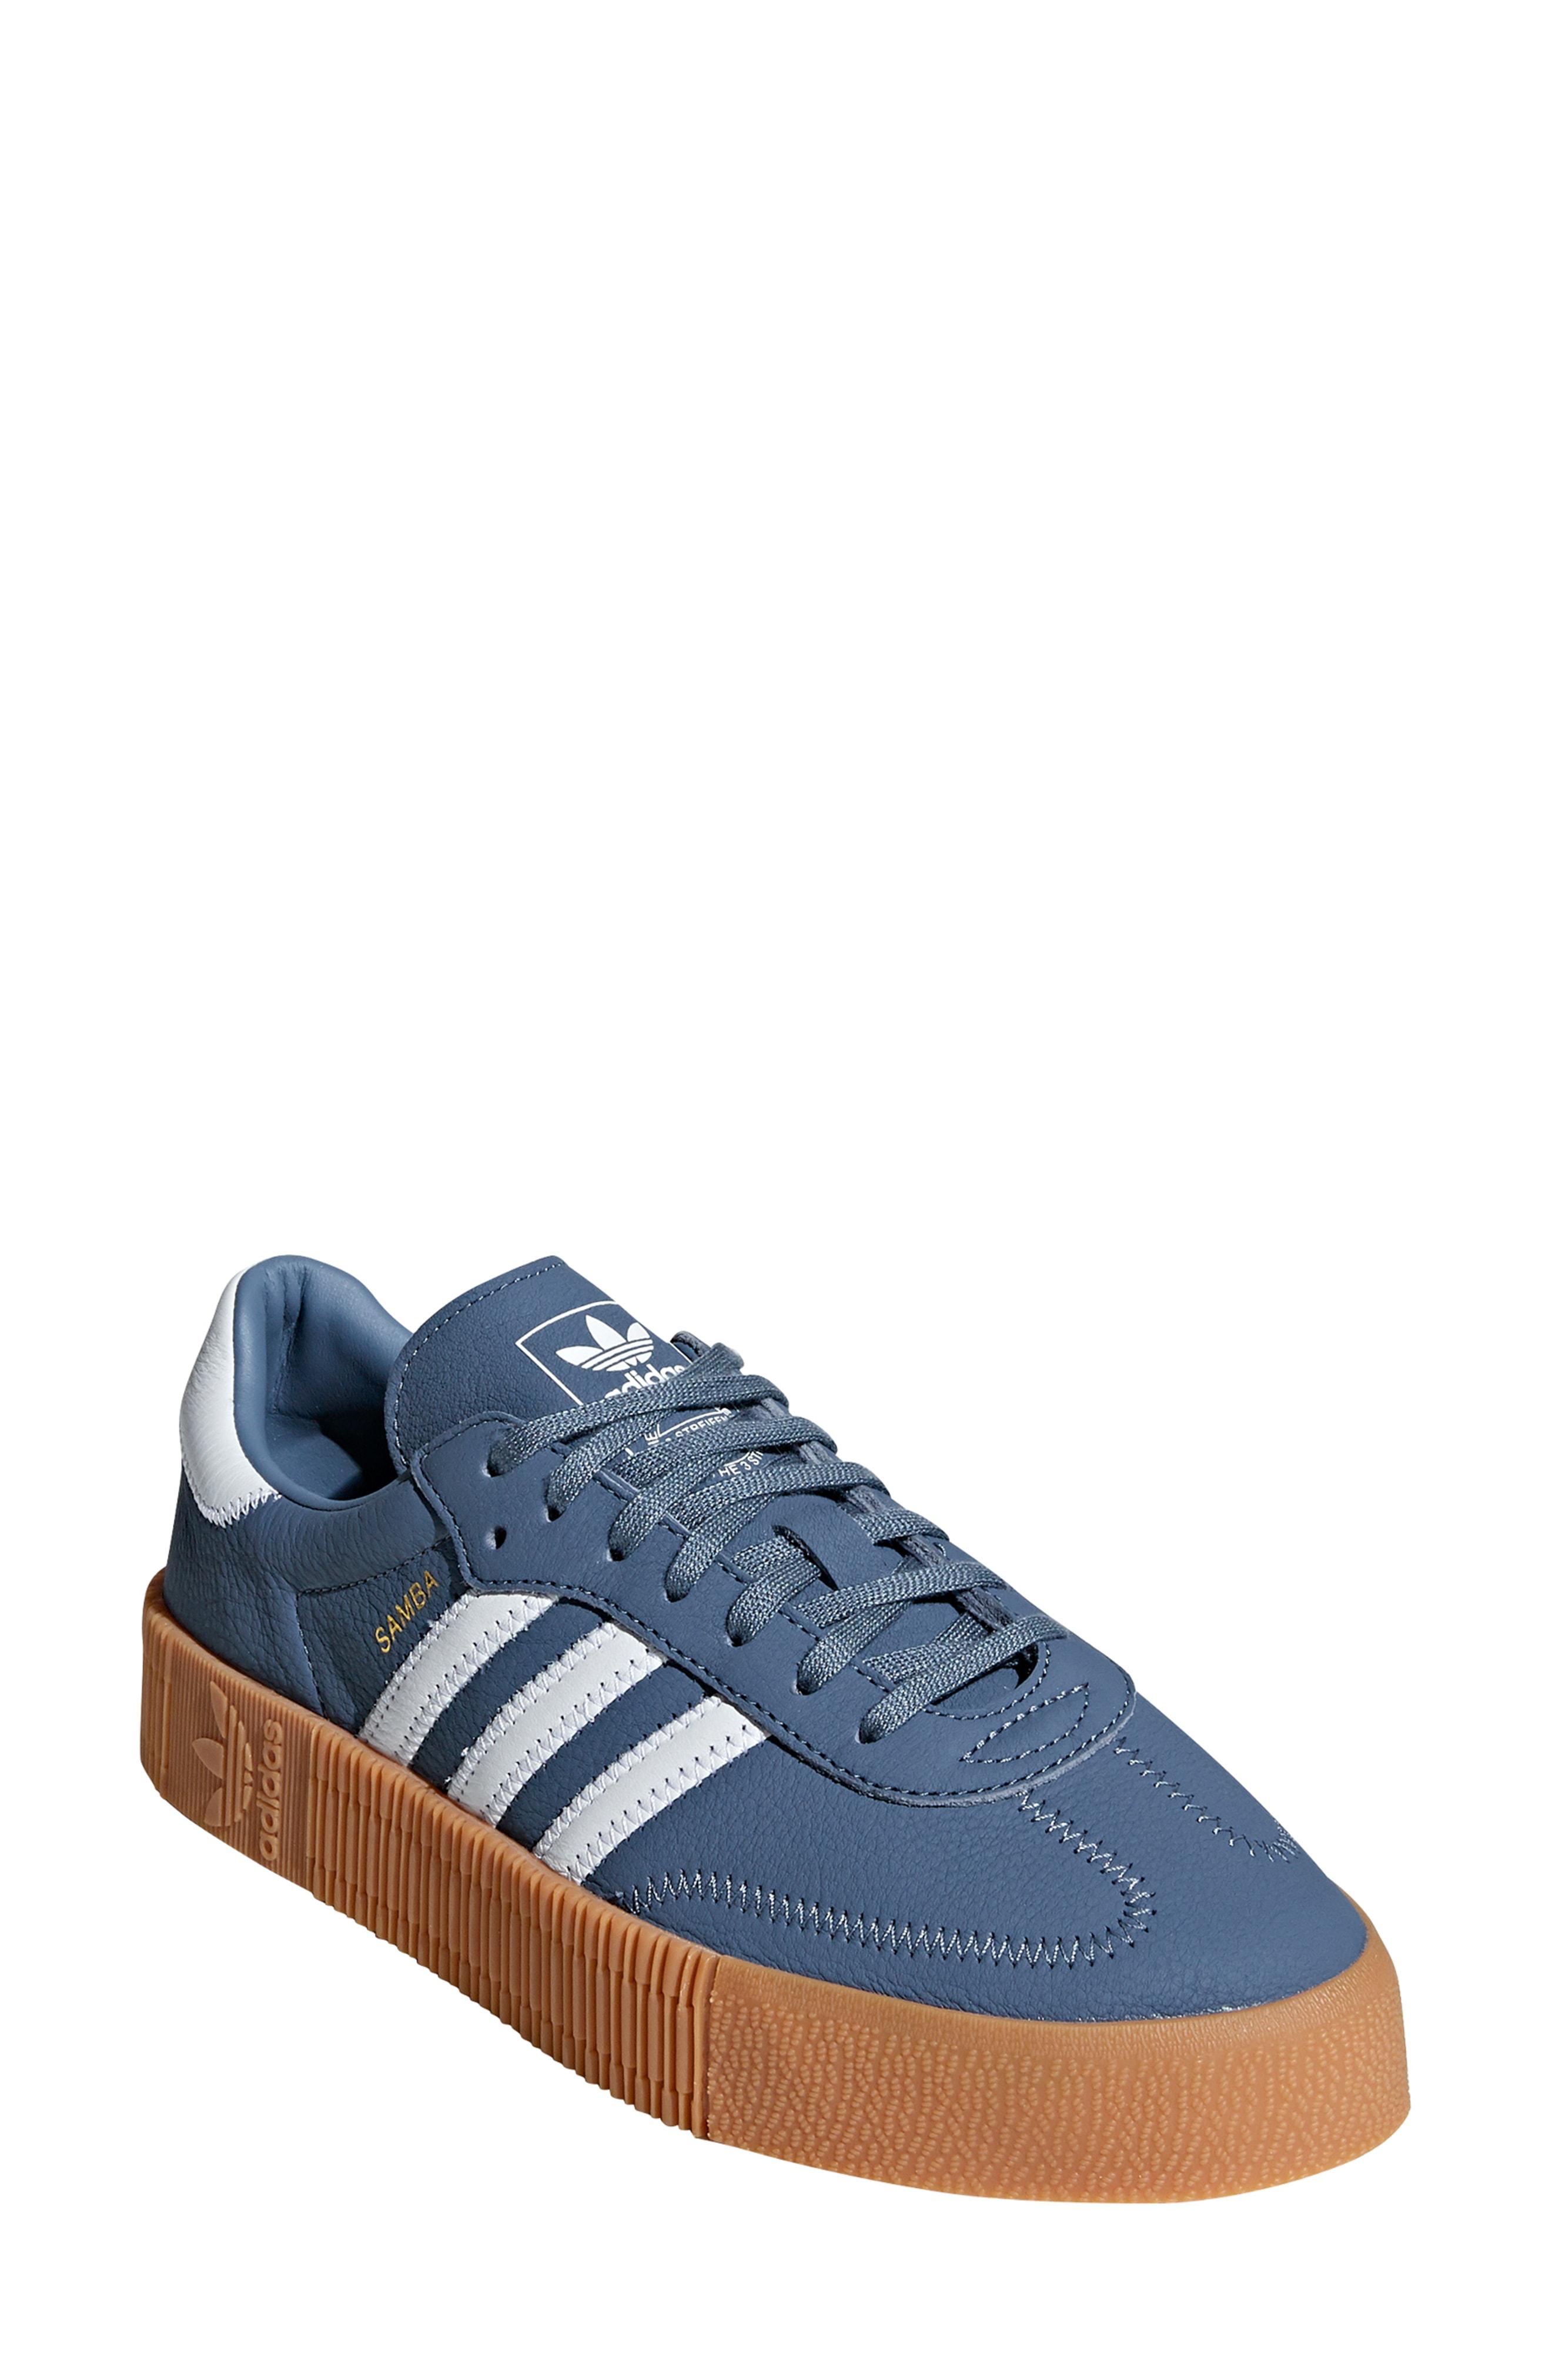 9e997897a01a Adidas Originals Samba Rose Sneaker In Silver Metallic  Orchid Tint ...